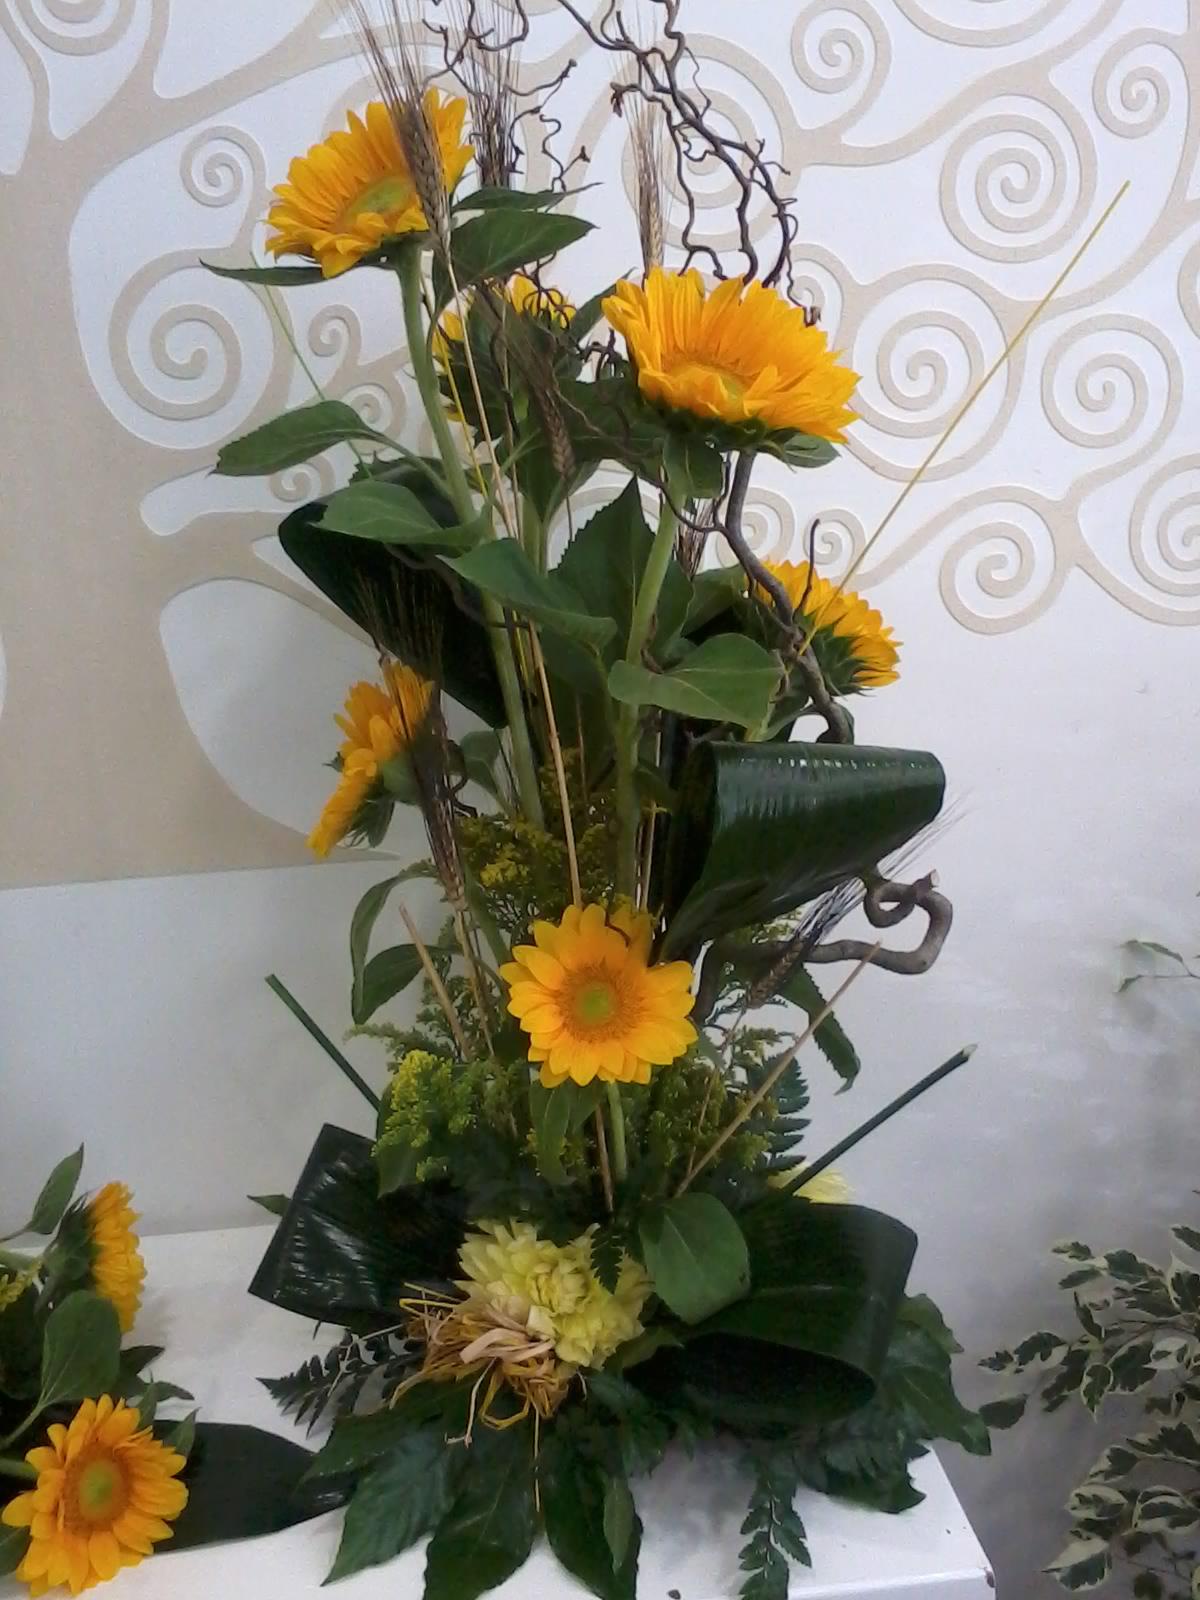 Idee Matrimonio Girasoli : Idee di claudia addobbo con girasoli